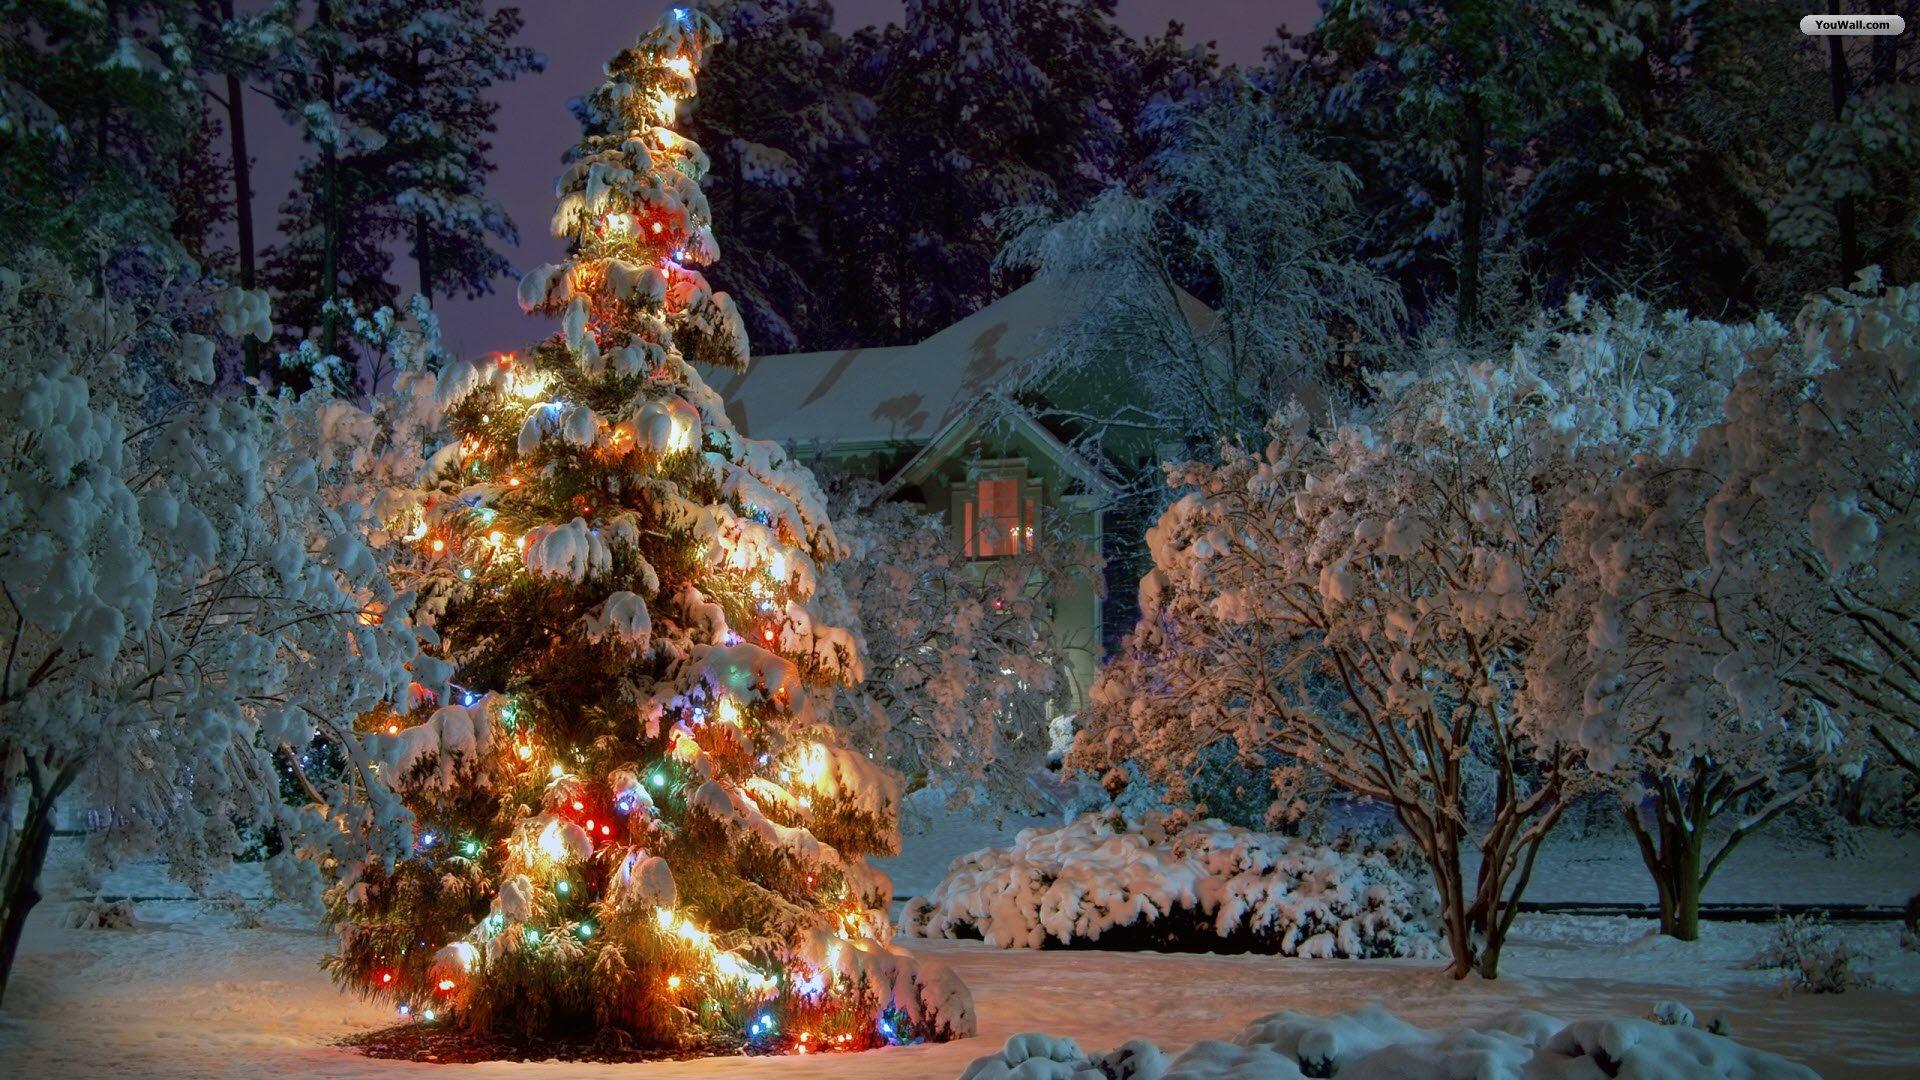 Winter Christmas Wallpaper Images at Landscape Monodomo 1920x1080